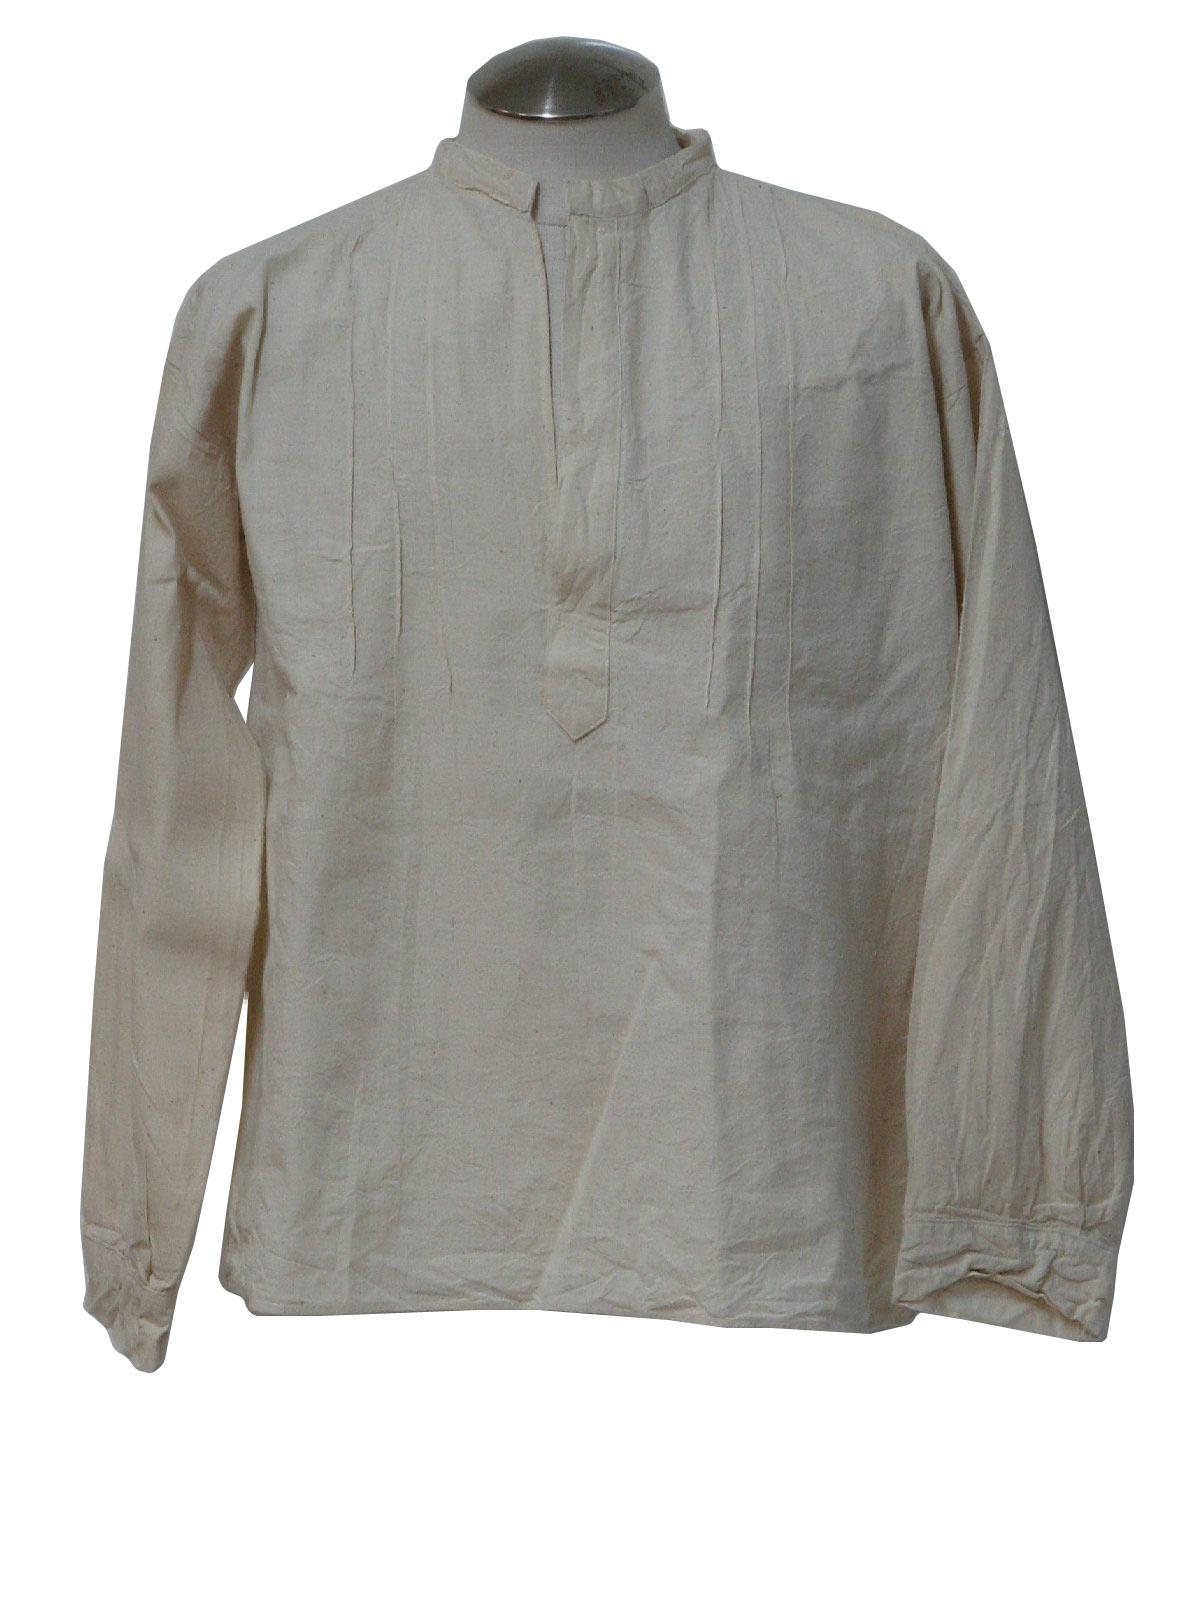 1970s Hippie Shirt 70s No Label Mens Off White Natural